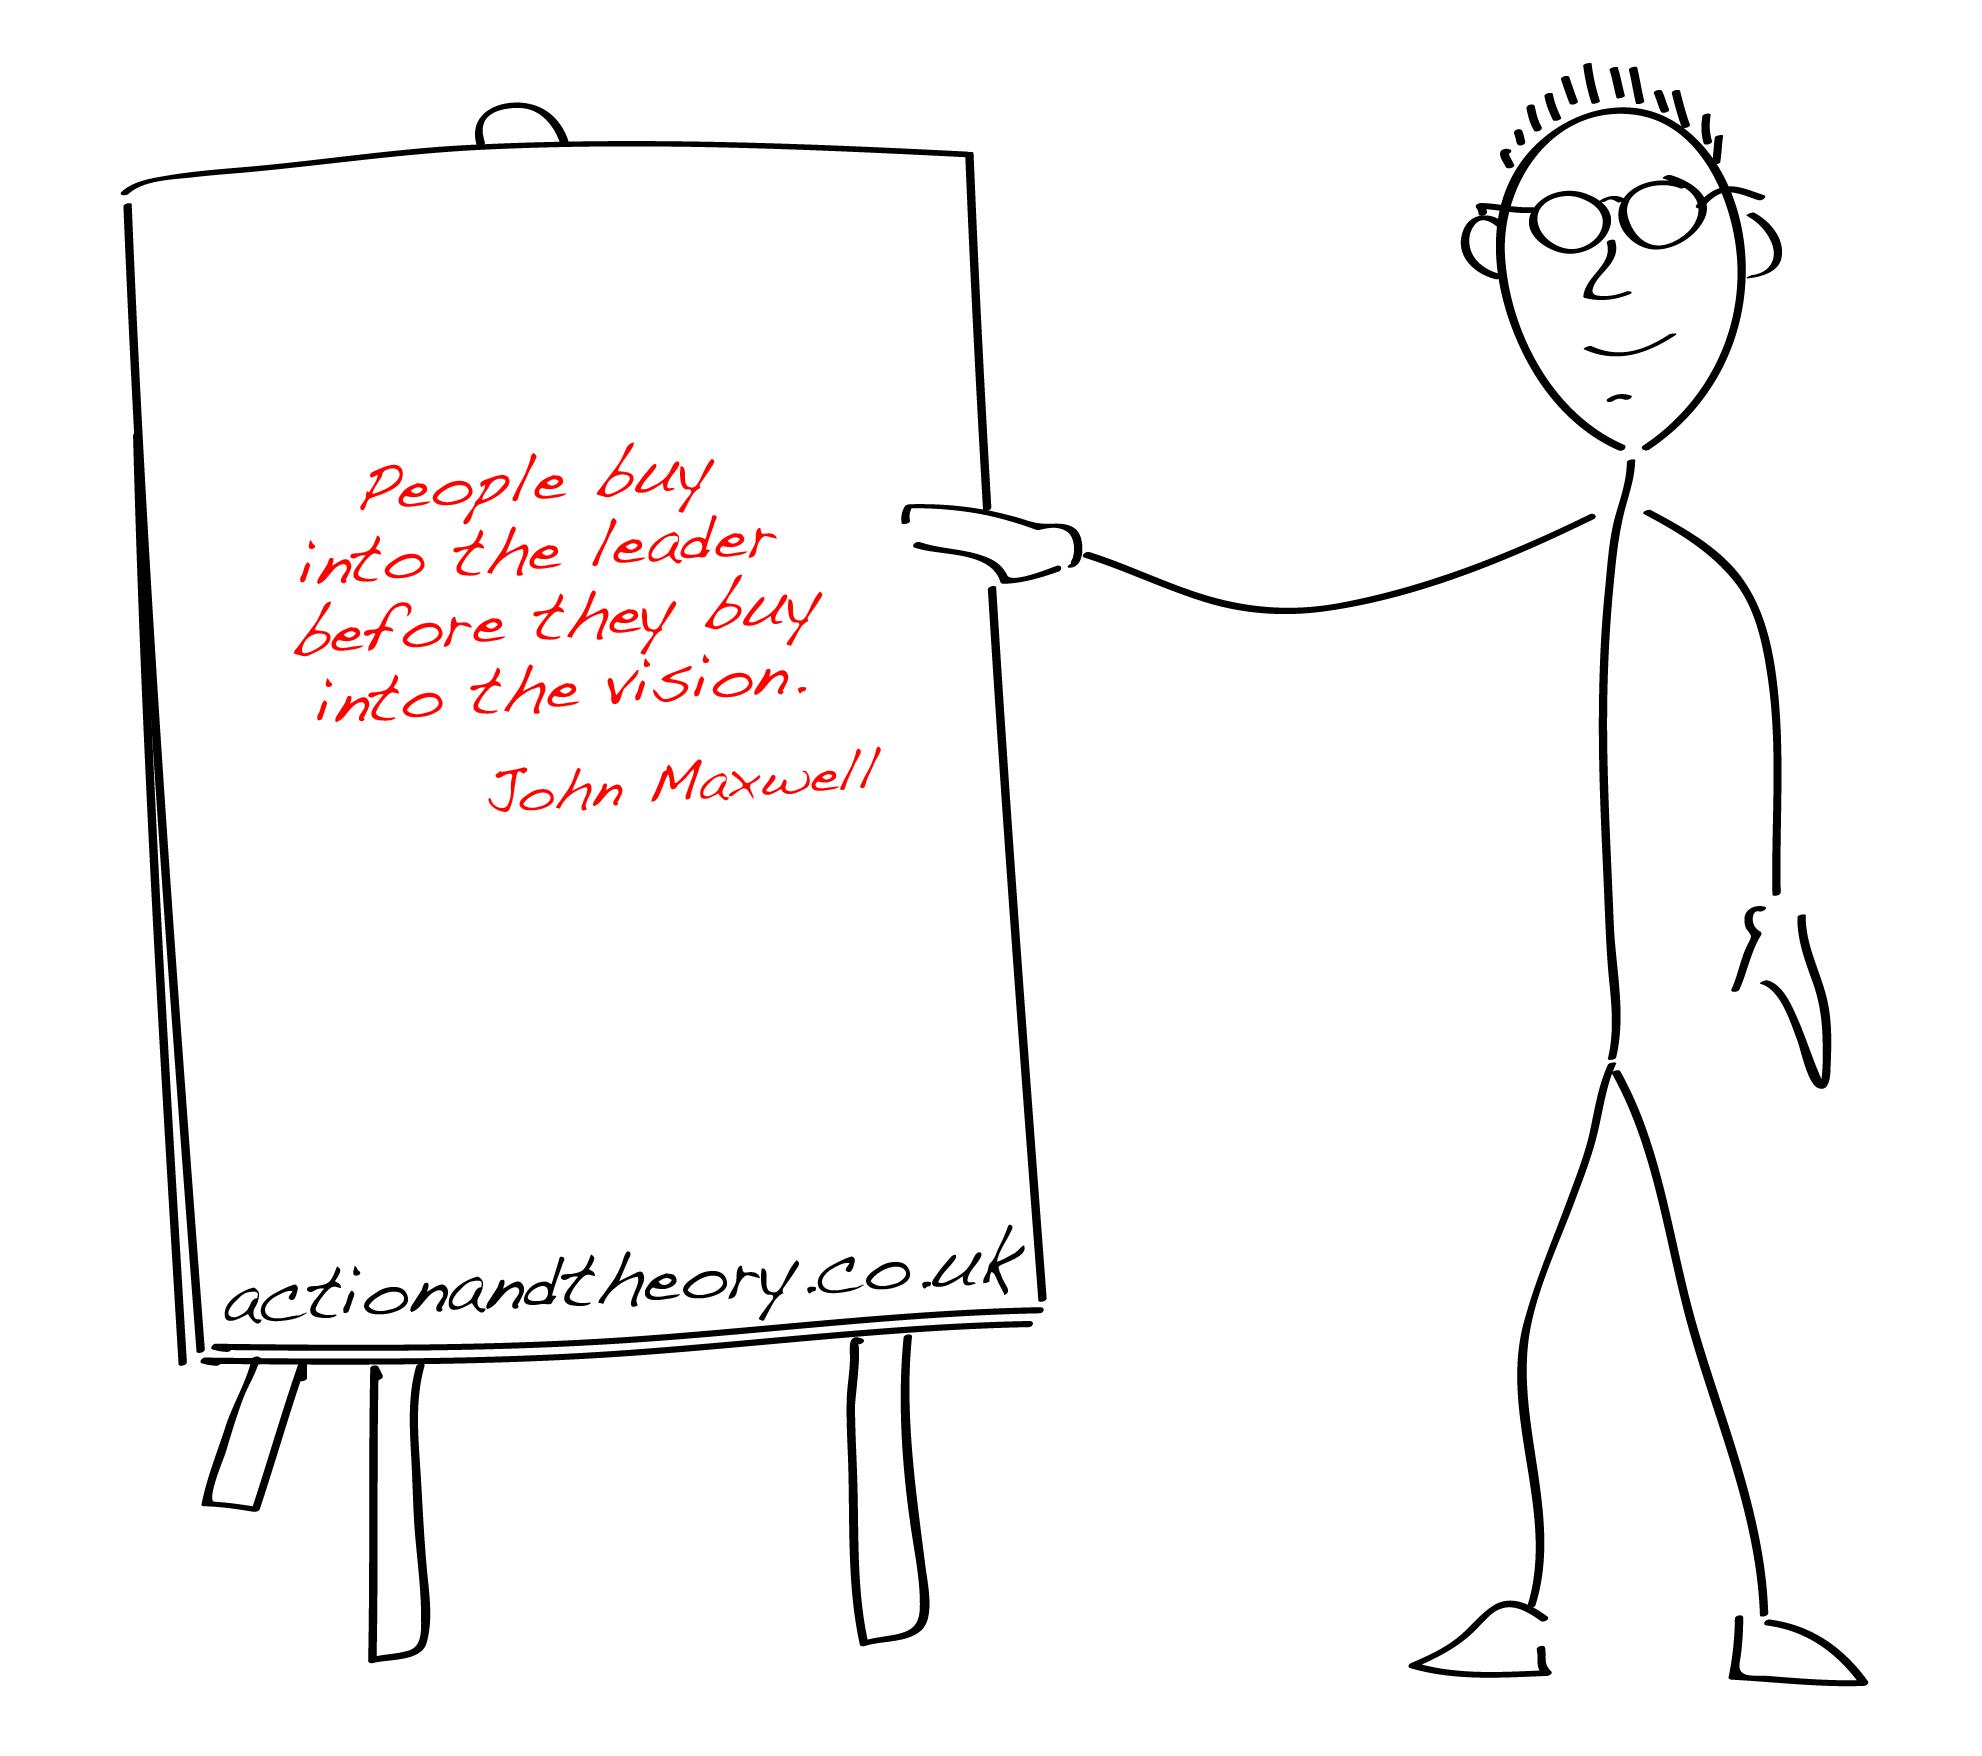 John Maxwell 2